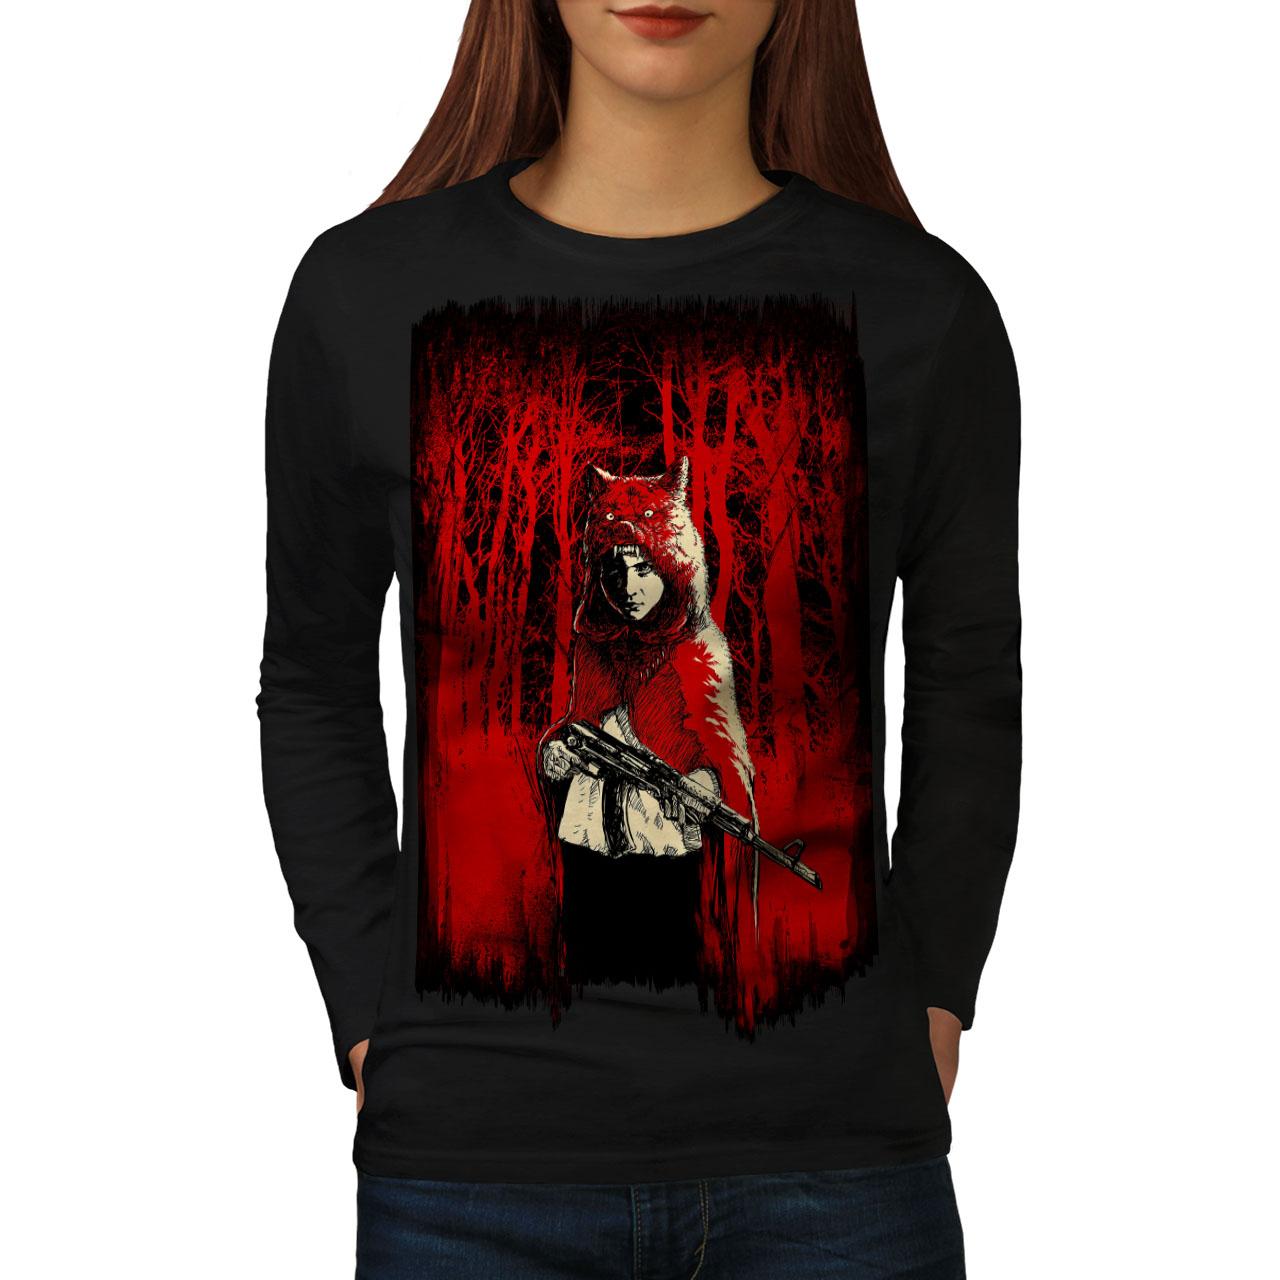 Wellcoda Chica Cazador Salvaje Mujer Manga Larga T-shirt, Diseño Casual Aterrador